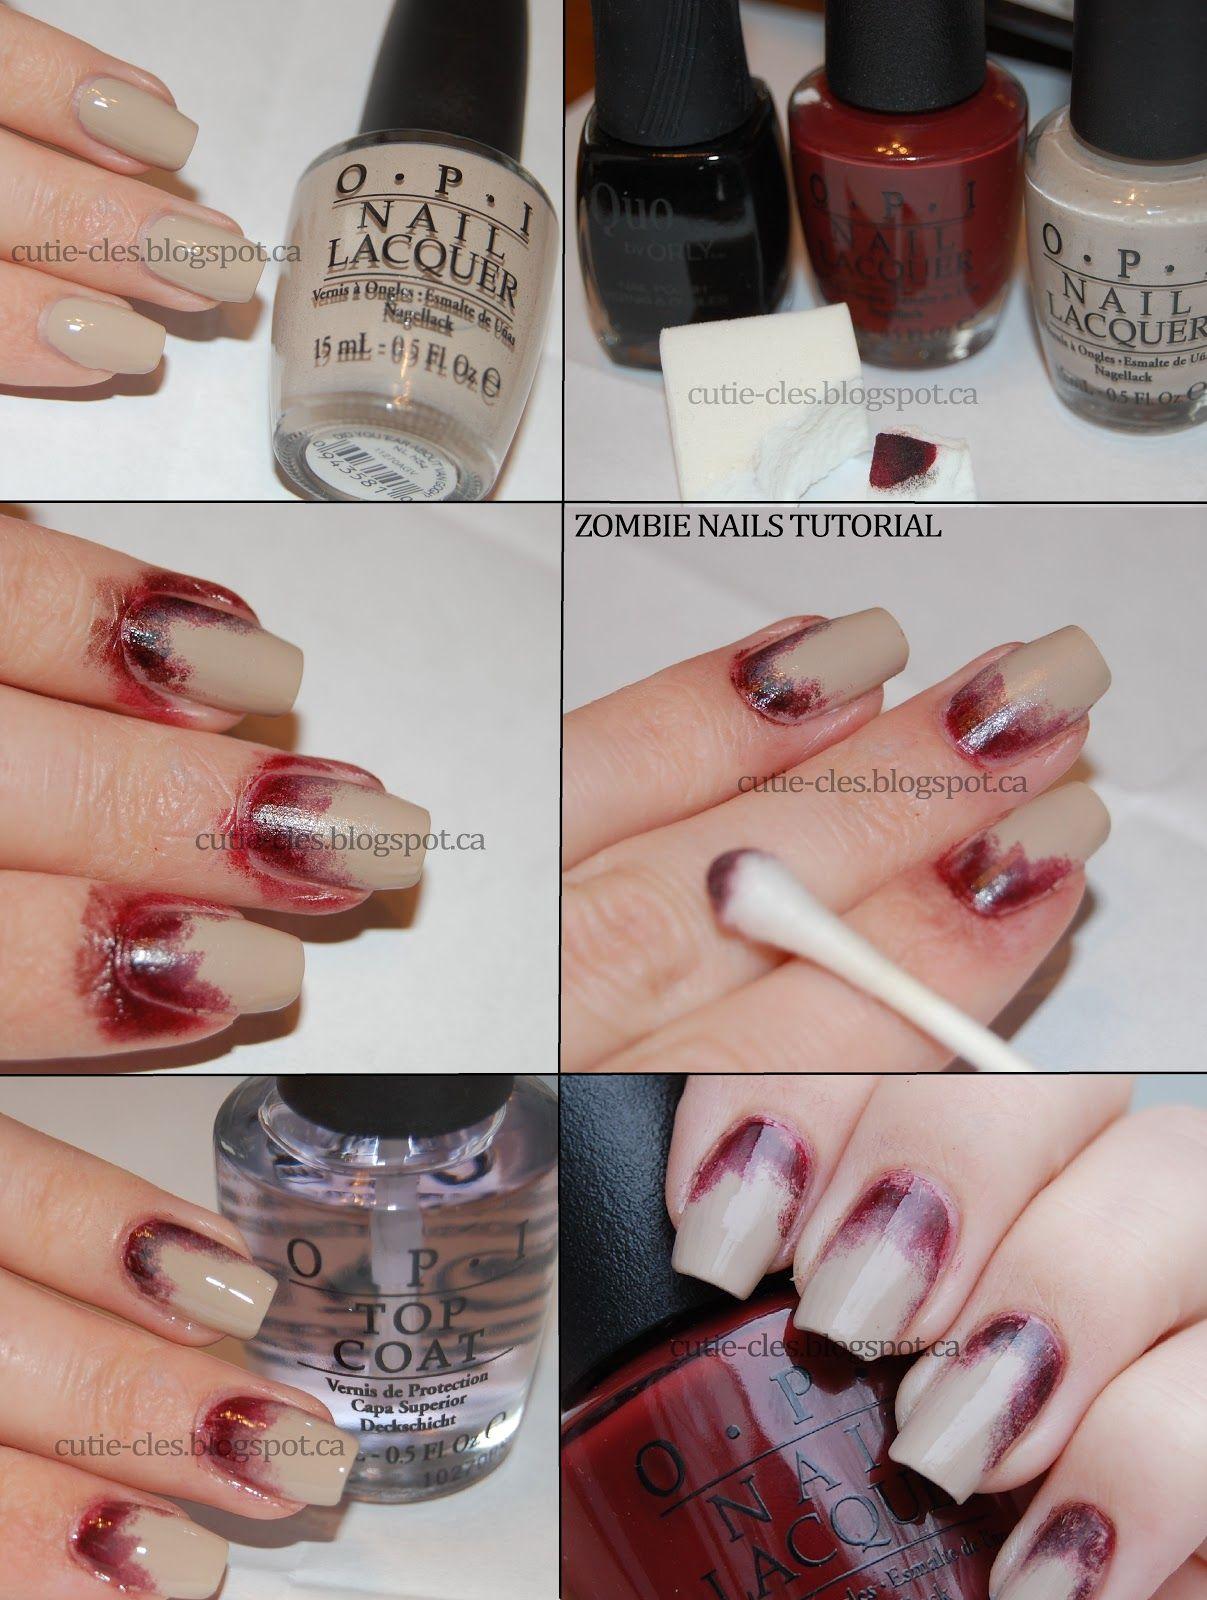 Tutorial for zombie nails - Tutorial For Zombie Nails Costume Inspirations Pinterest